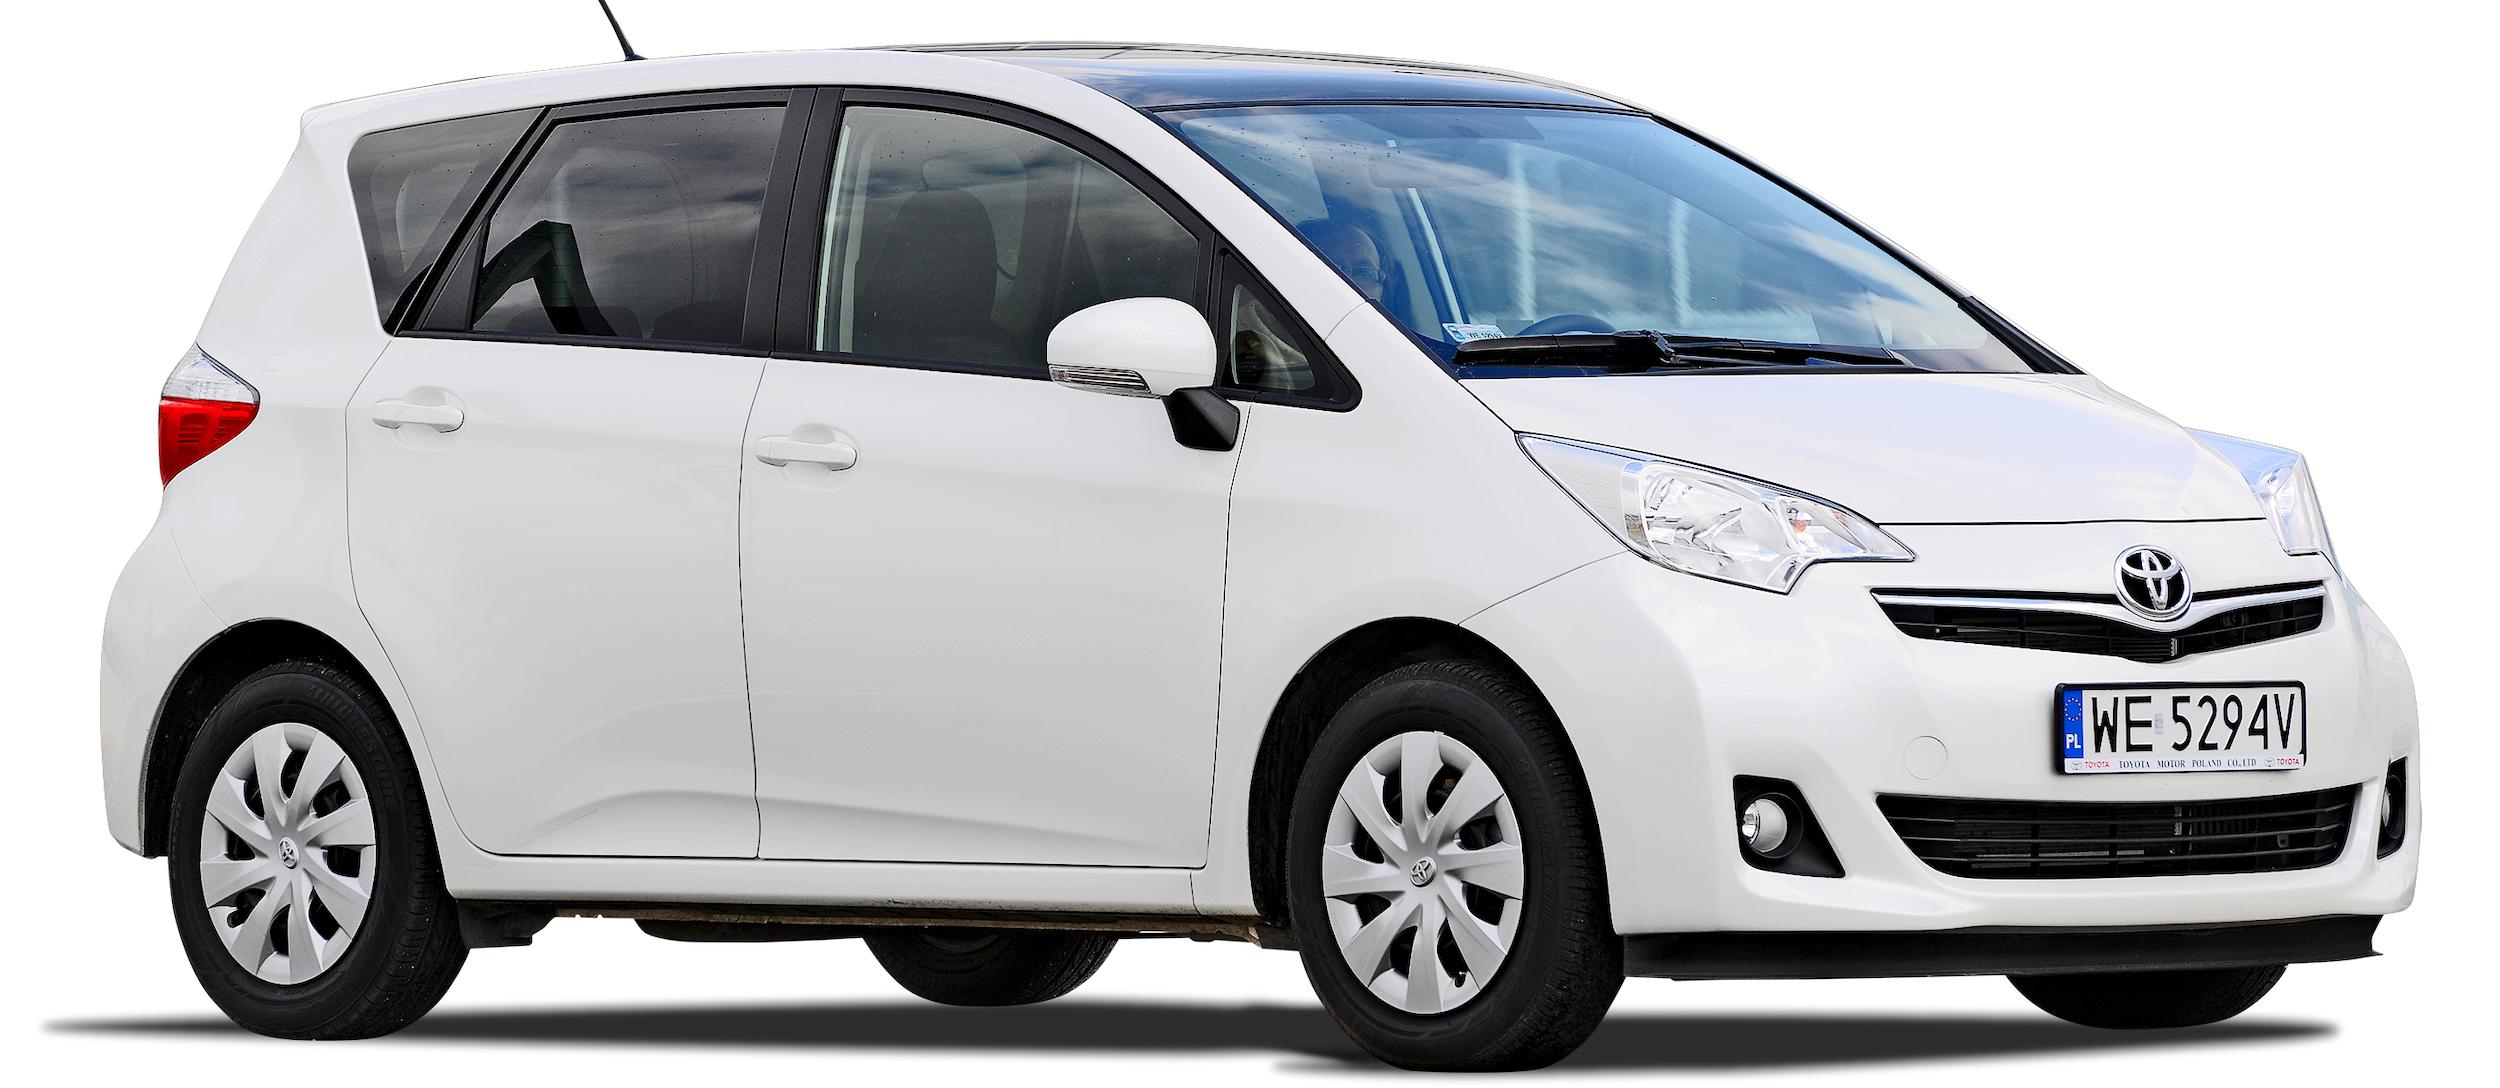 Toyota Verso-S (2010-2017)